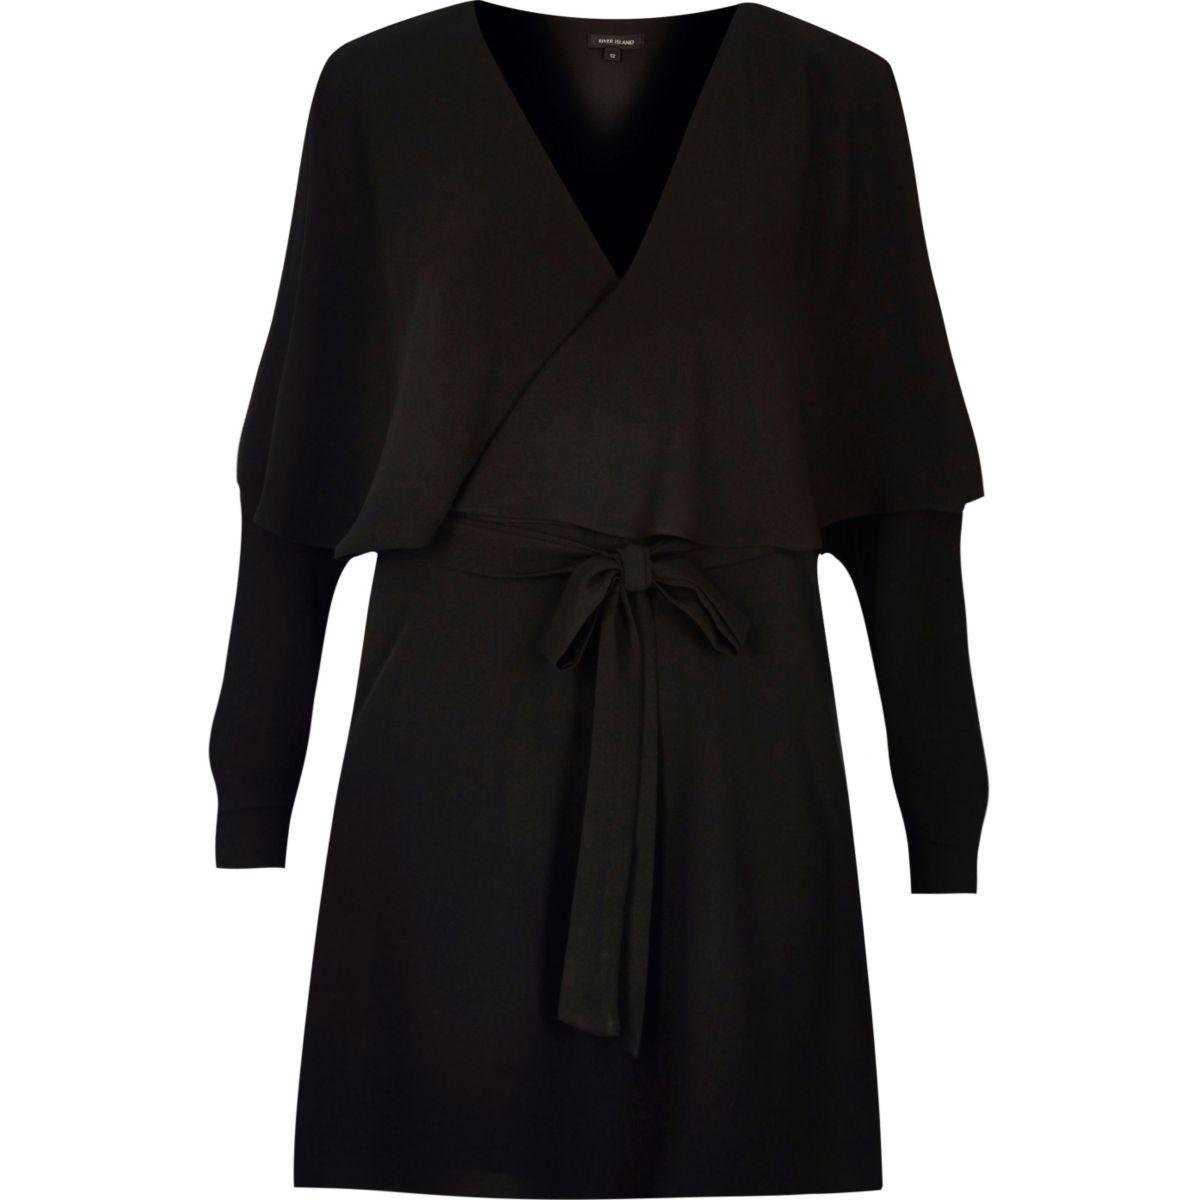 Black long sleeve frill tea dress